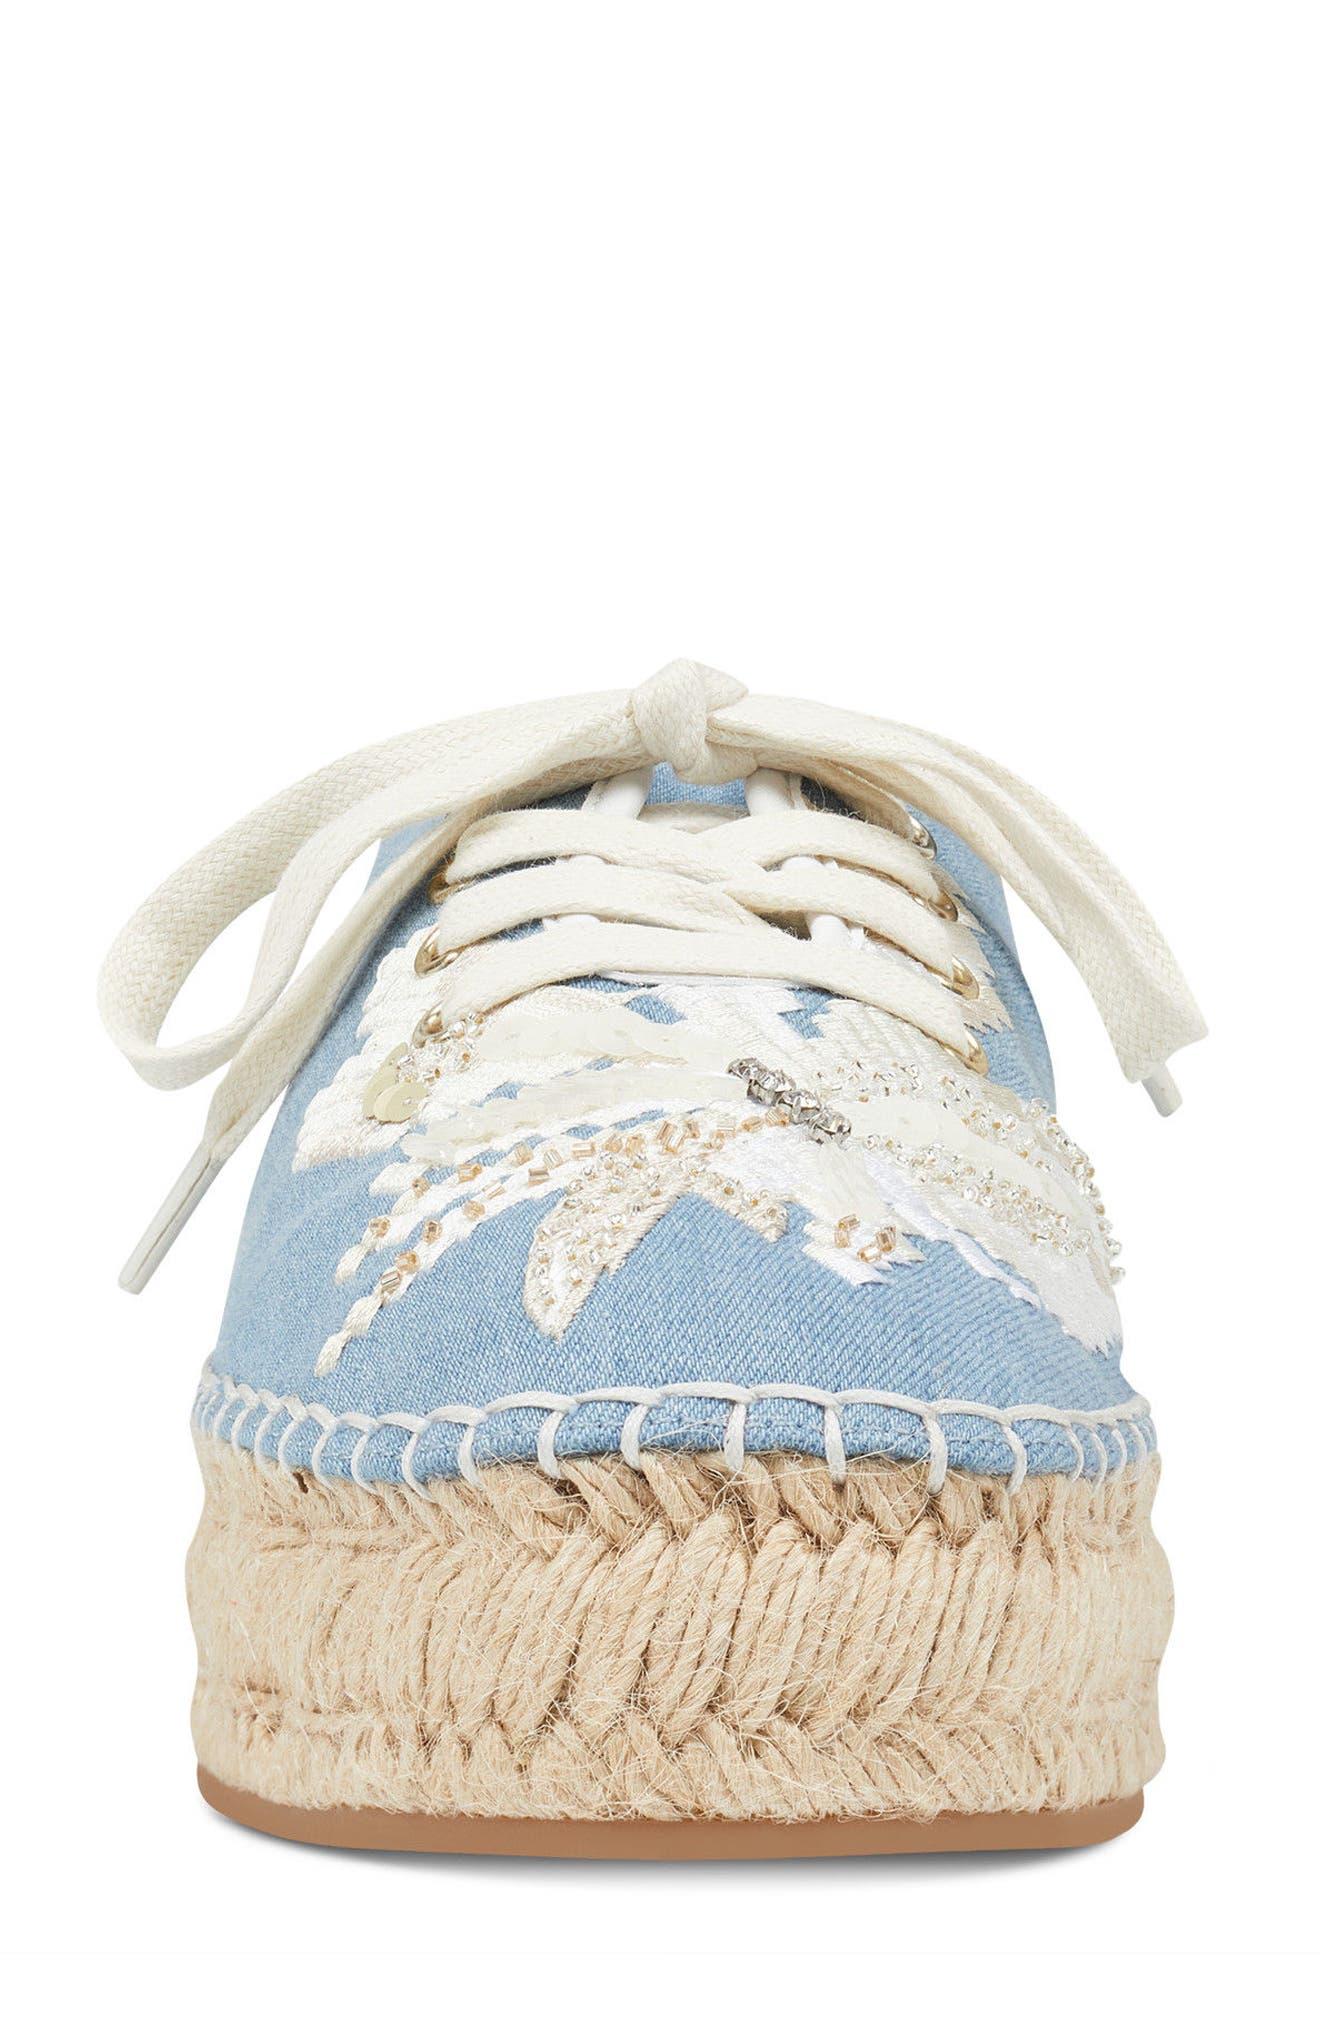 Guinup Embellished Espadrille Sneaker,                             Alternate thumbnail 4, color,                             Light Blue/ White Denim